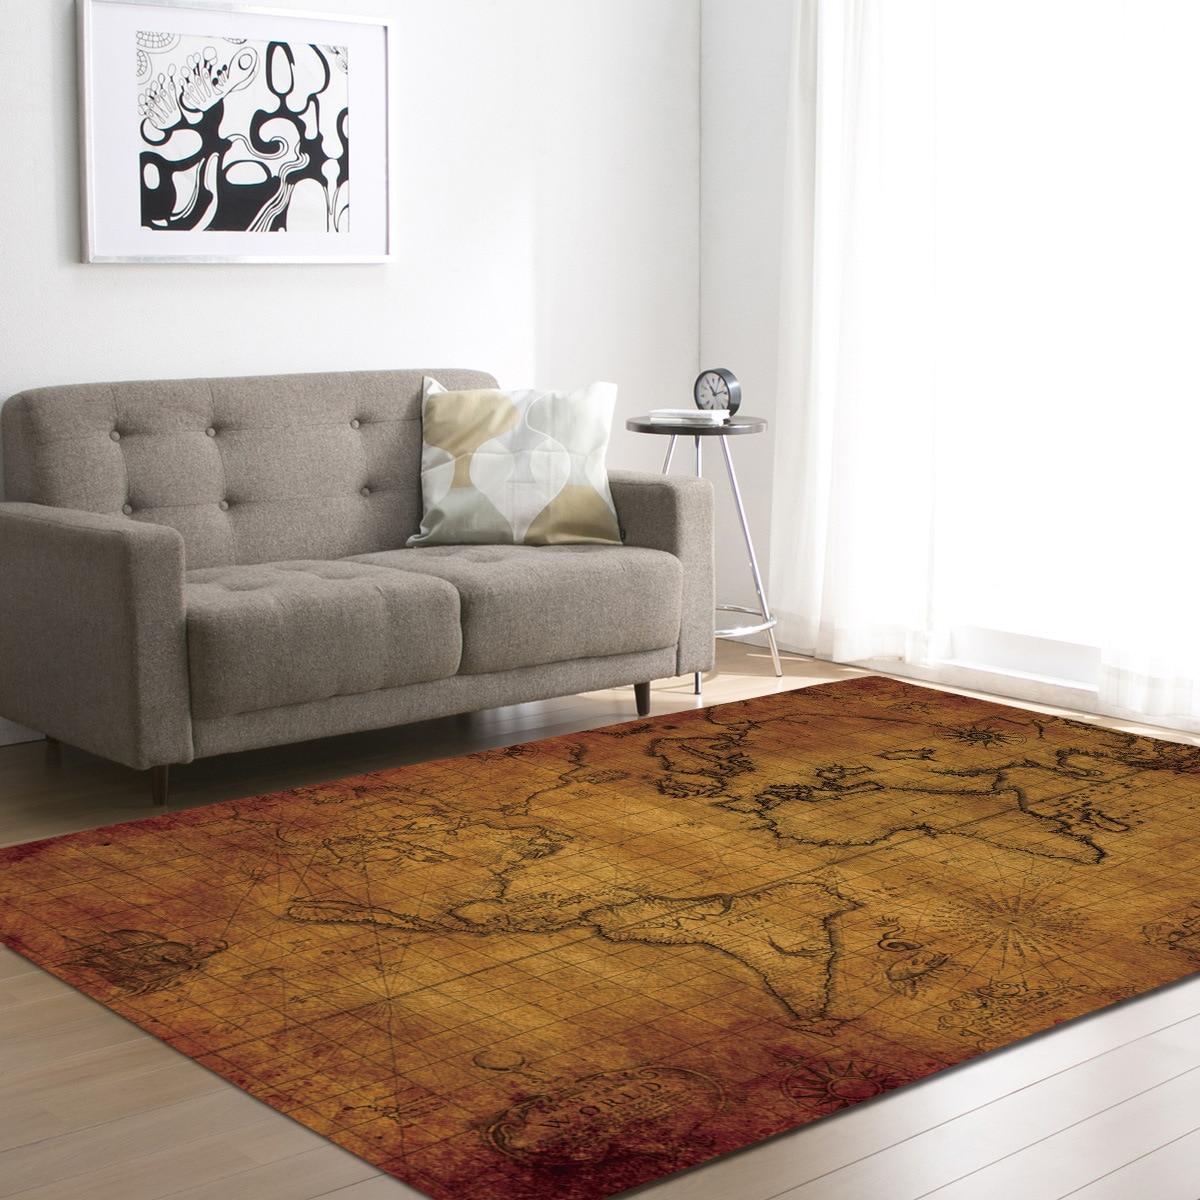 World Map Pattern Carpets For Living Room Kids Bedroom